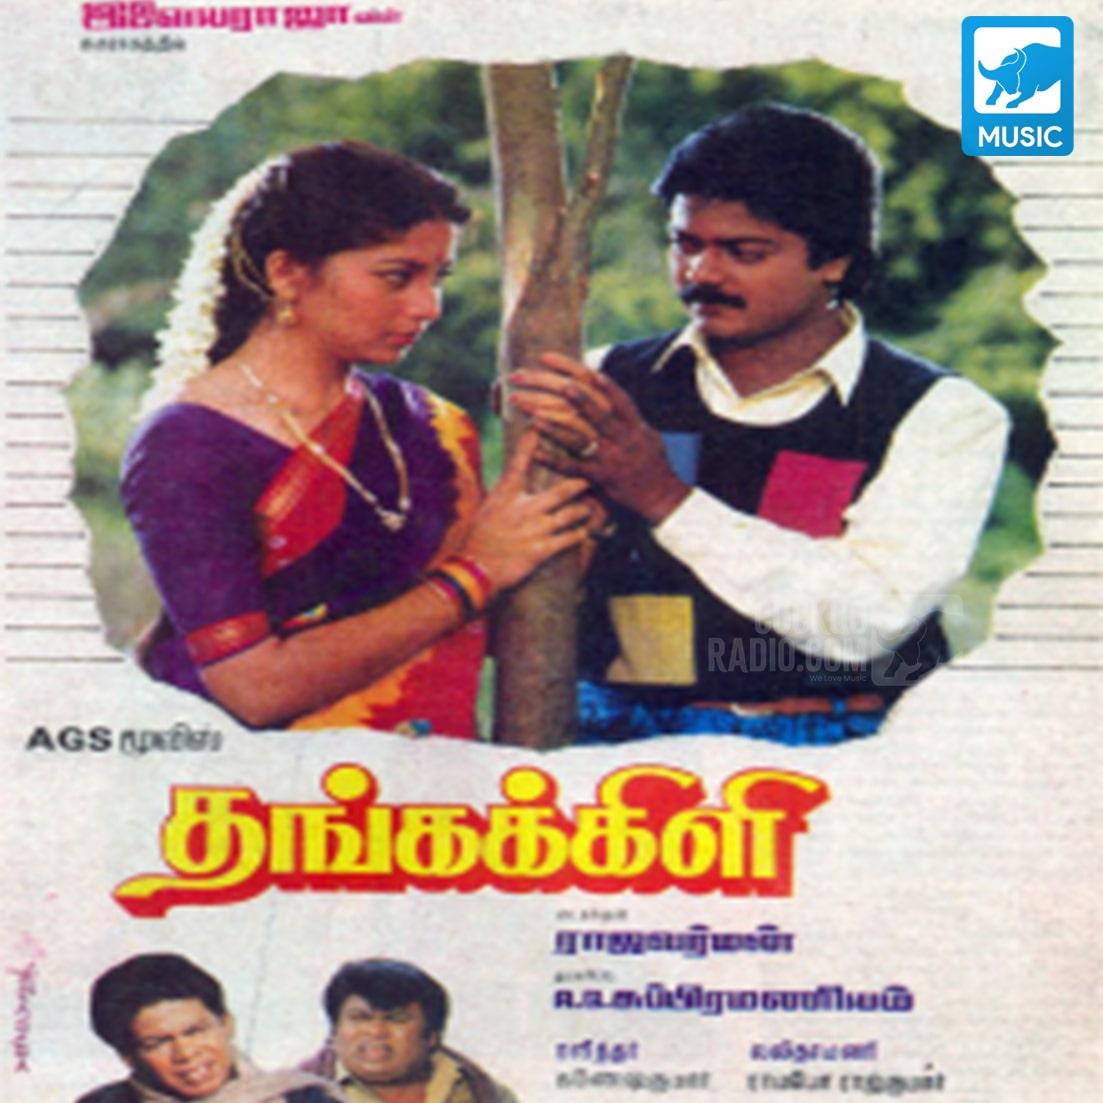 Dhangakili,Murali,Ilayaraja,Murali Sad Songs,ilayaraja Songs